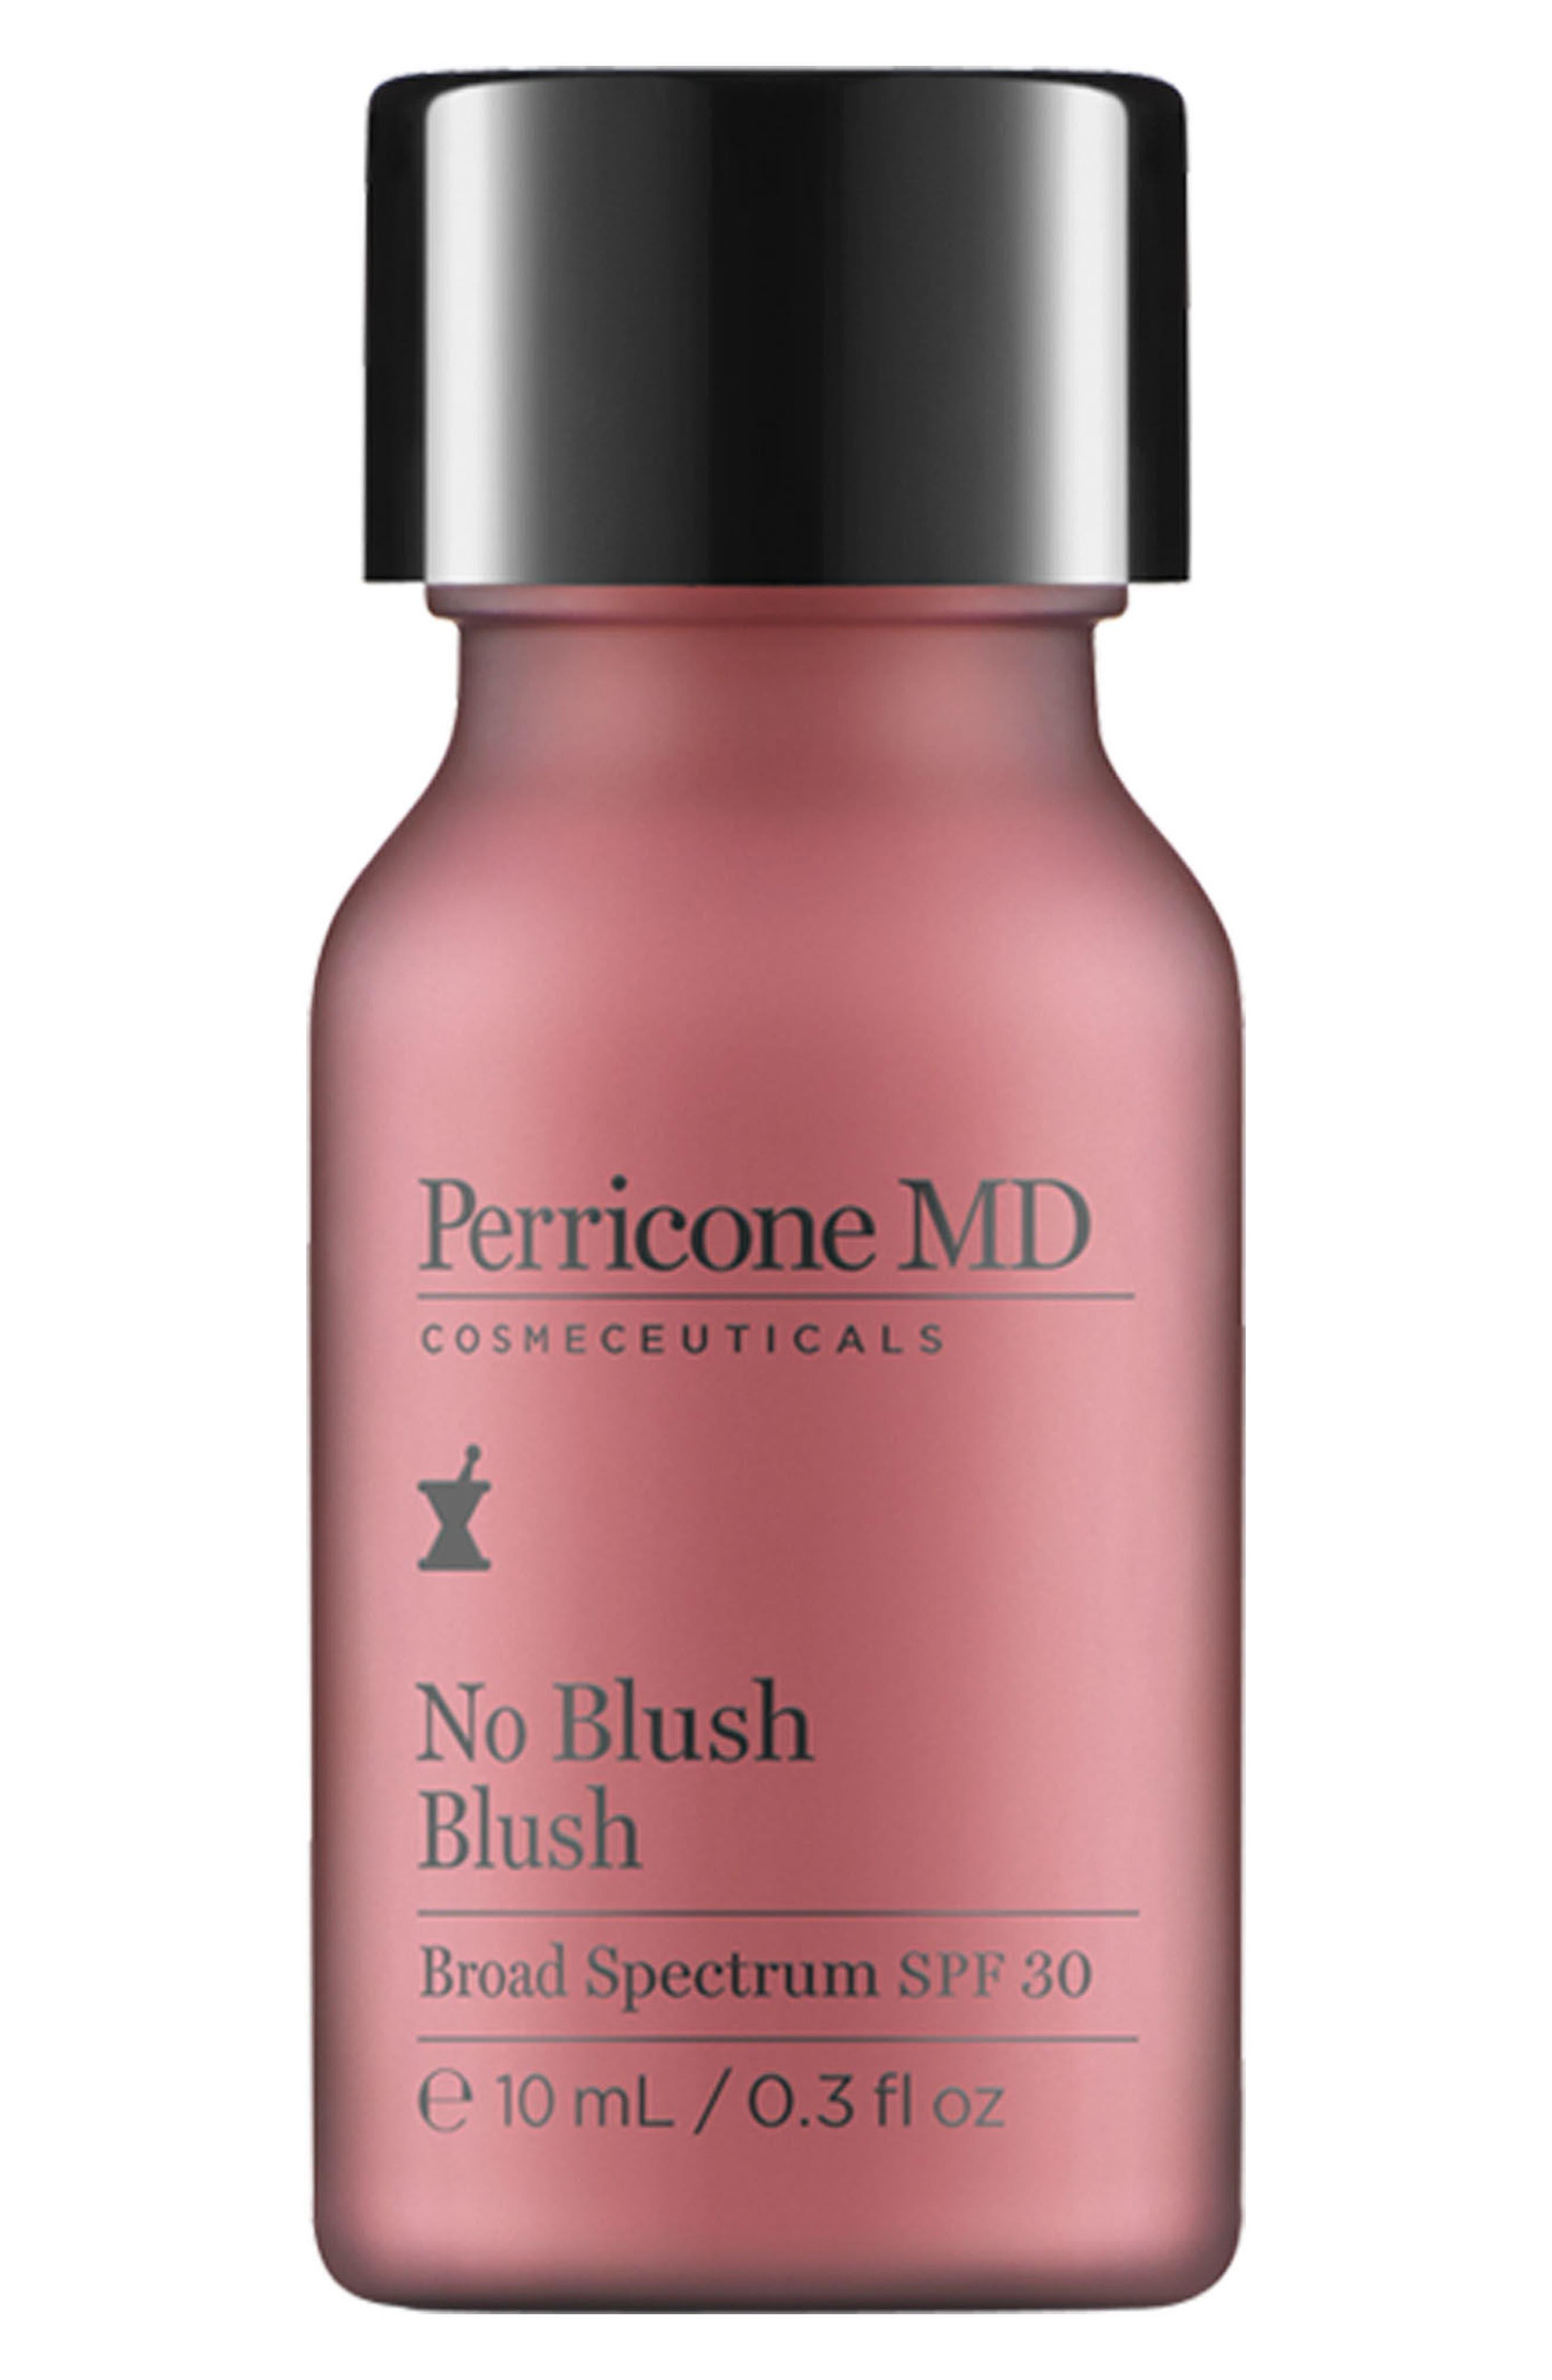 Perricone MD No Blush Blush Broad Spectrum SPF 30